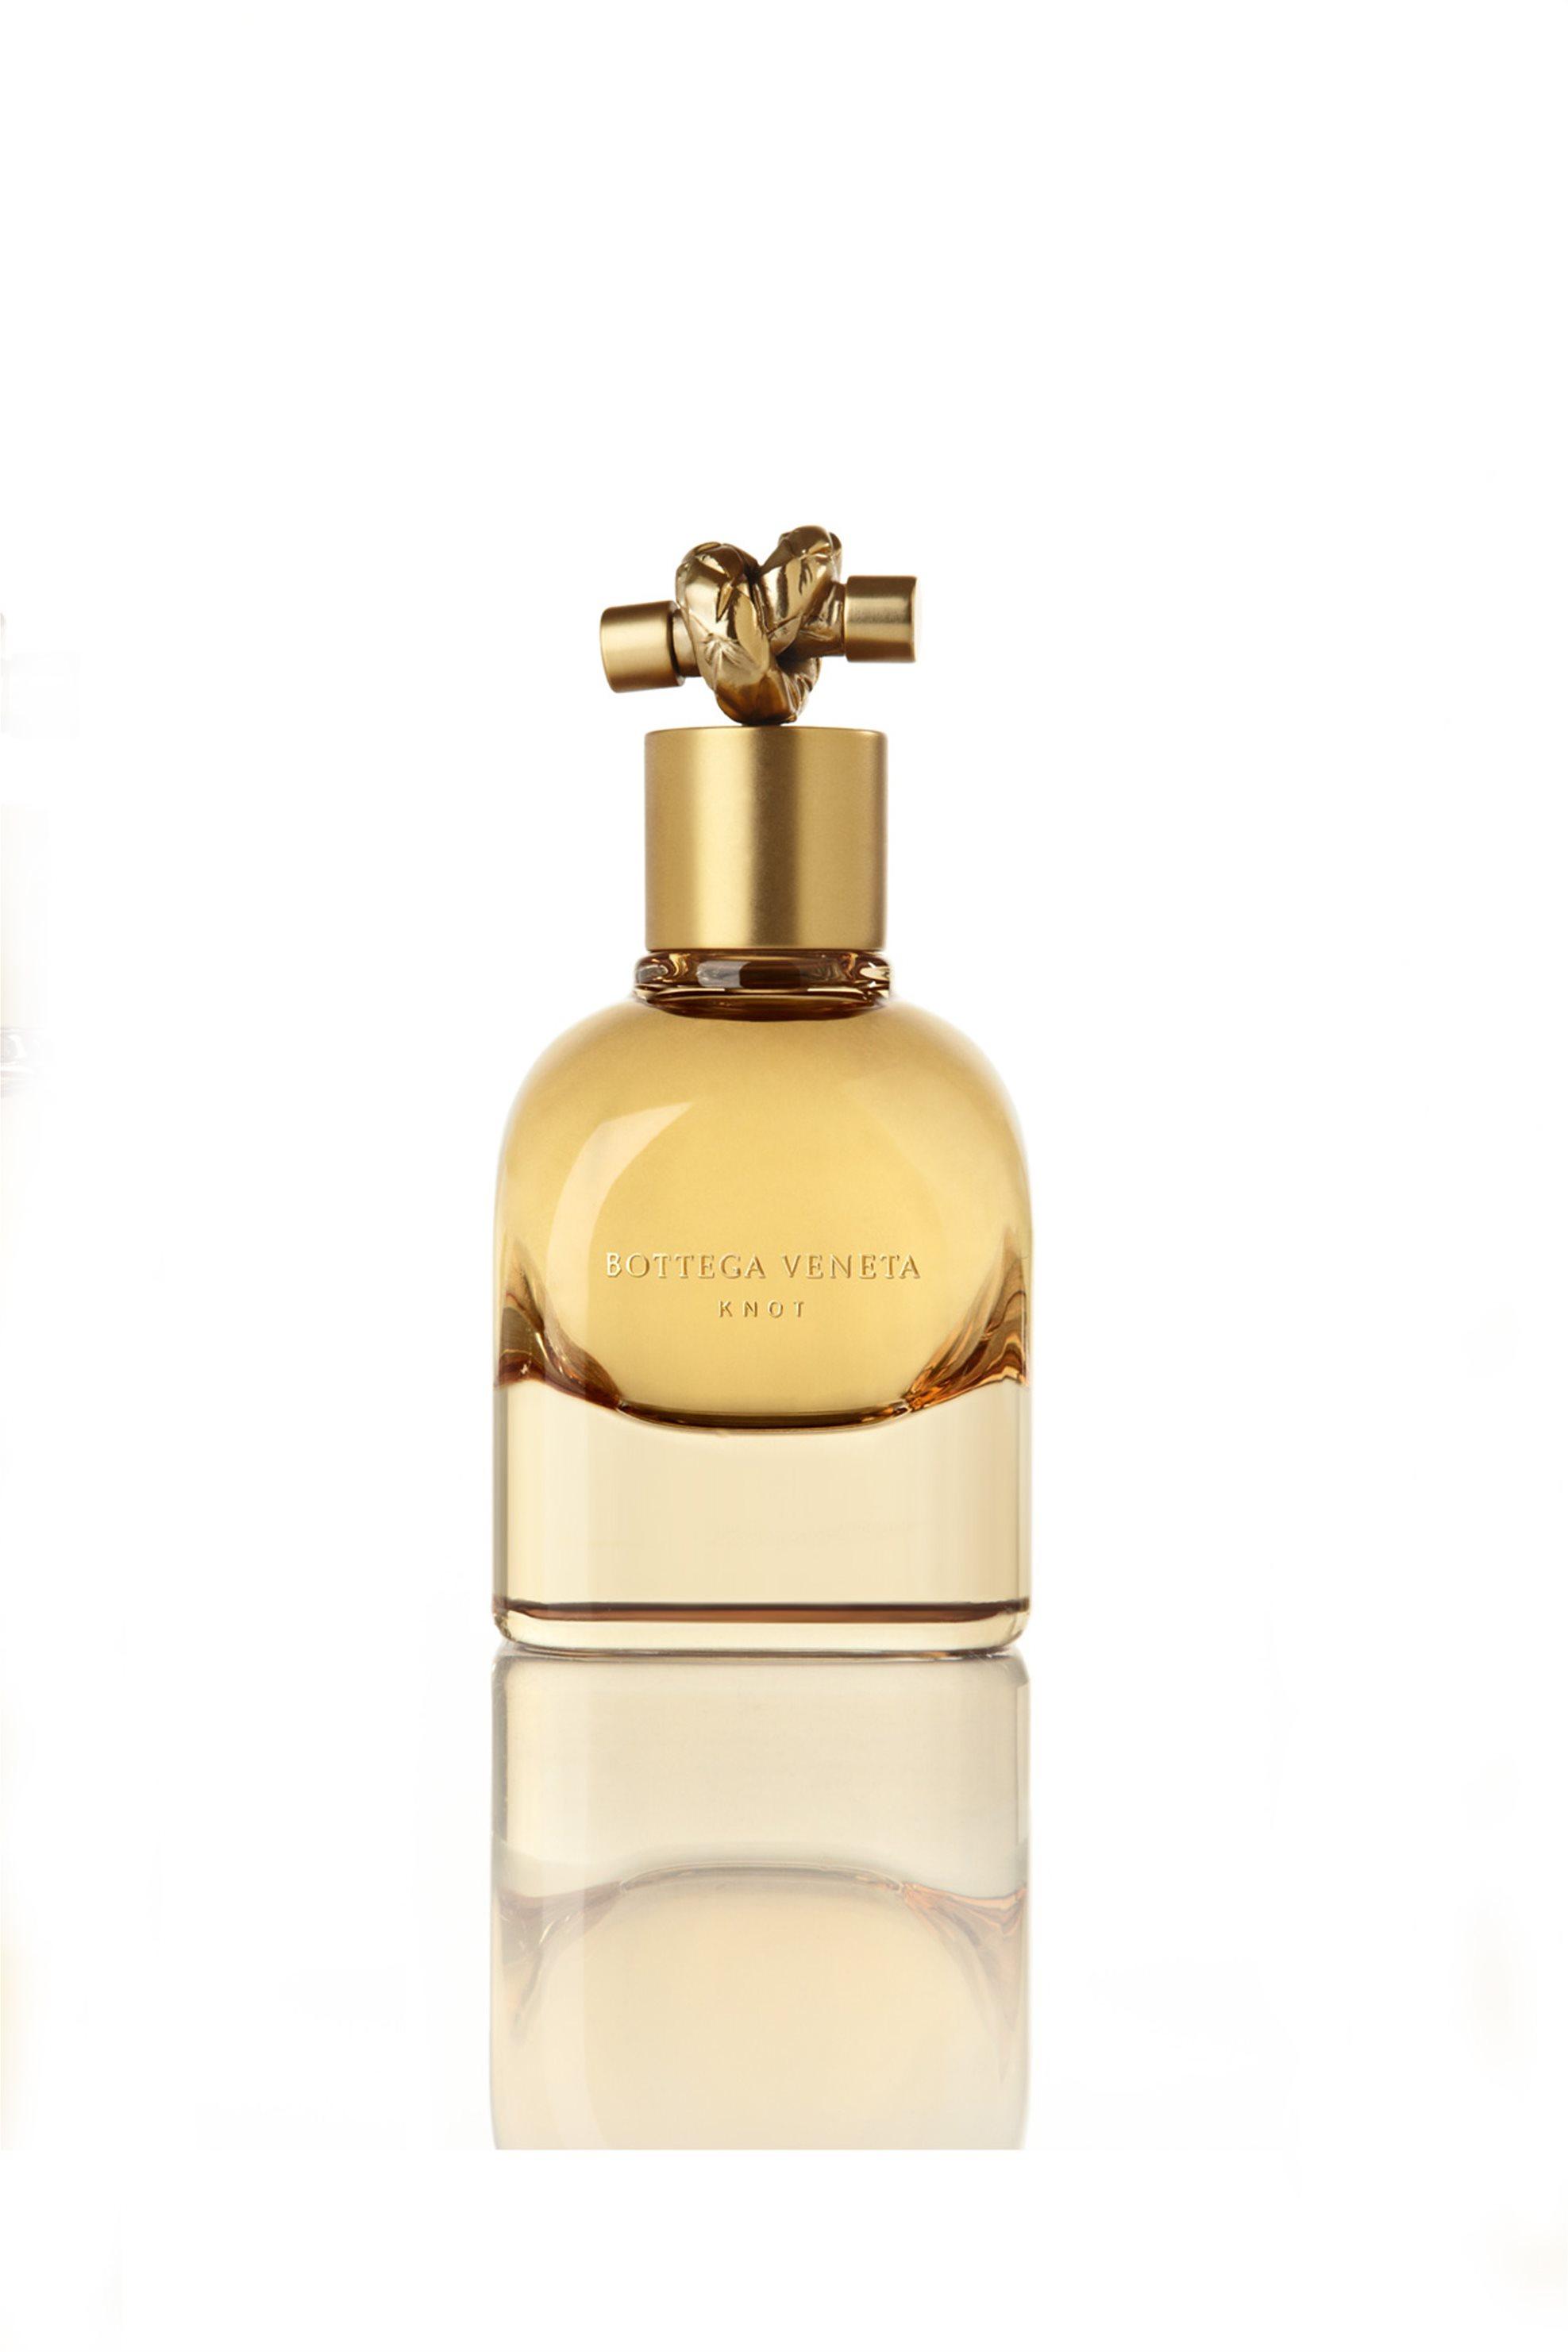 Bottega Veneta Knot EdP 50 ml - 1429562 ομορφια   καλλυντικα επιλεκτικησ   αρώματα   γυναικεία αρώματα   eau de parfum